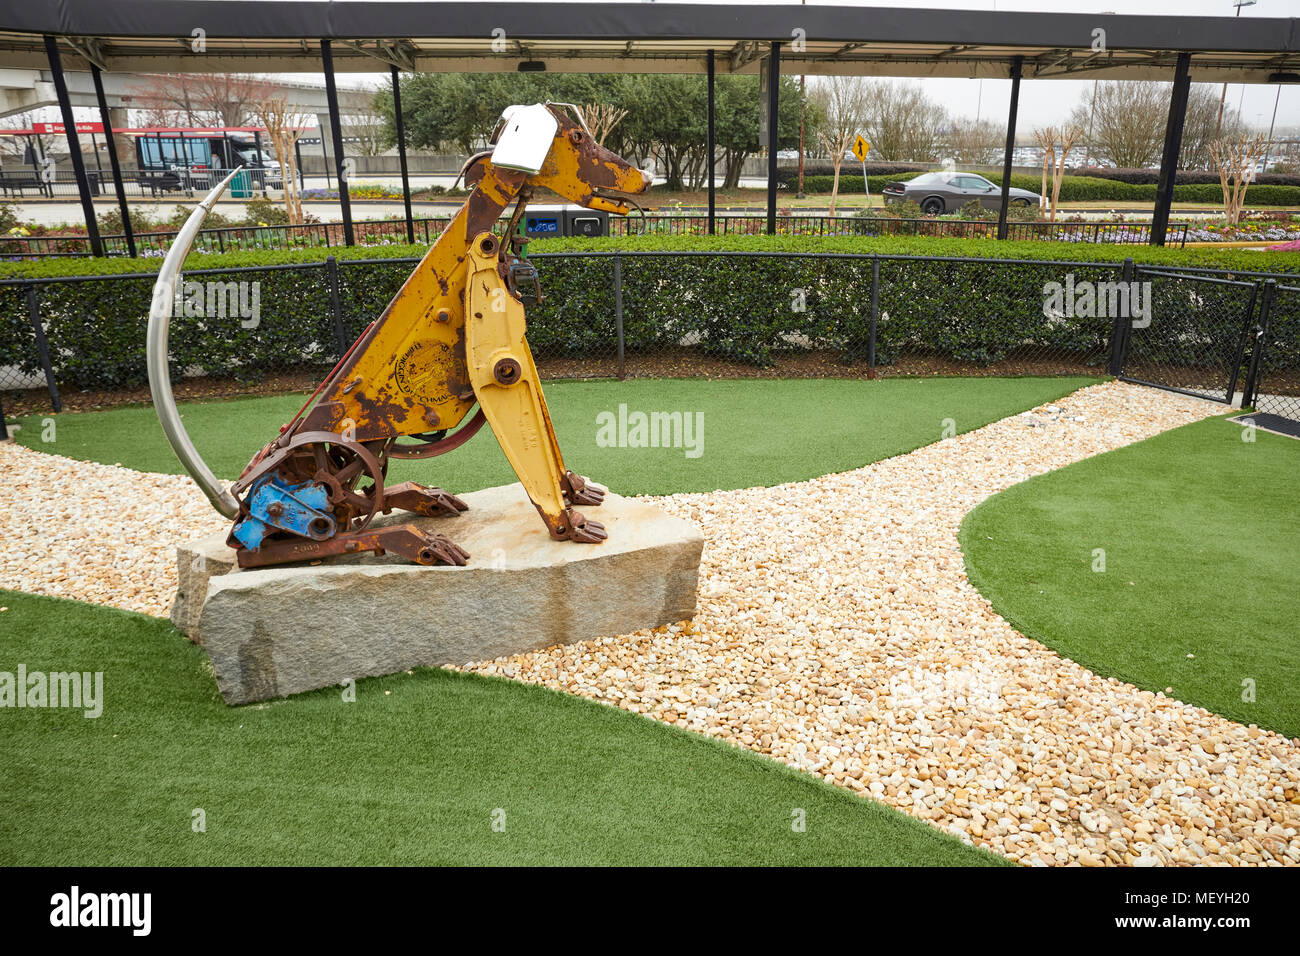 Atlanta capital of the U.S. state of Georgia, Hartsfield-Jackson International Airport dog park with dog statue - Stock Image